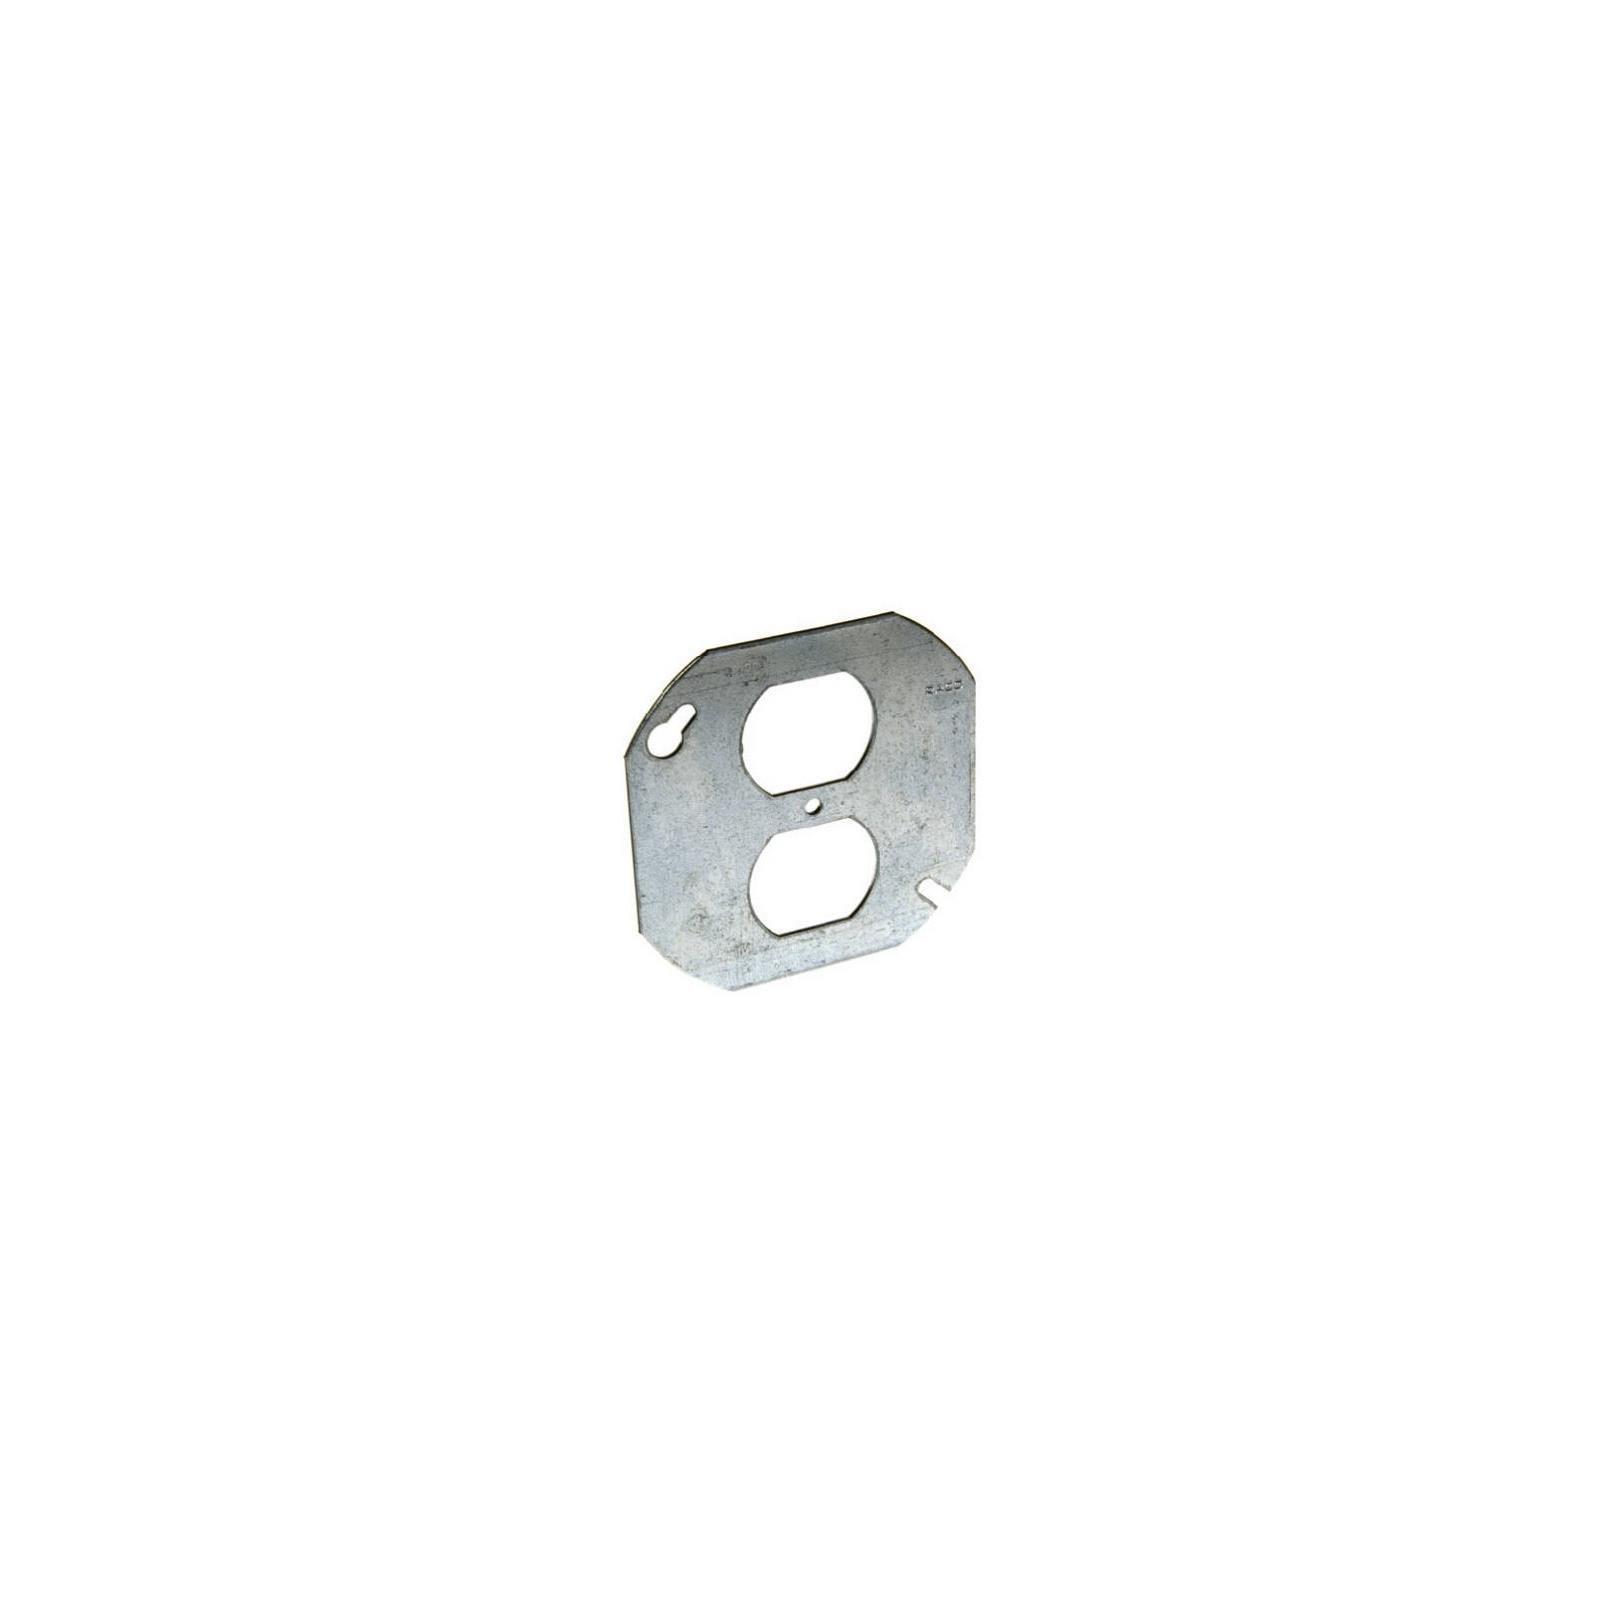 Hubbell Raco 0731 Single Gang Octagon Duplex Box Cover